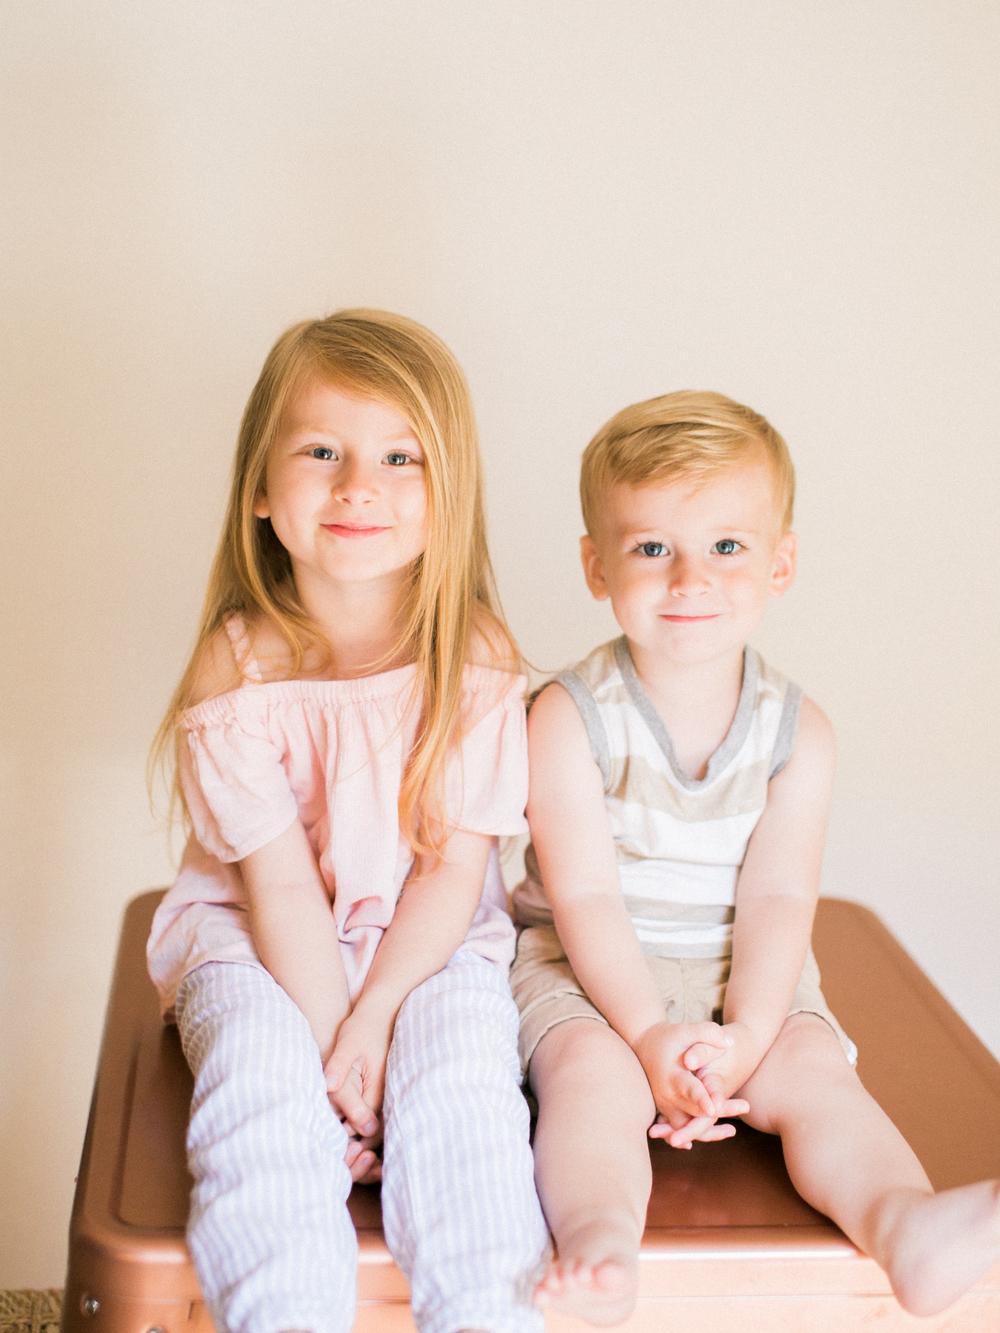 kids-june-7.jpg